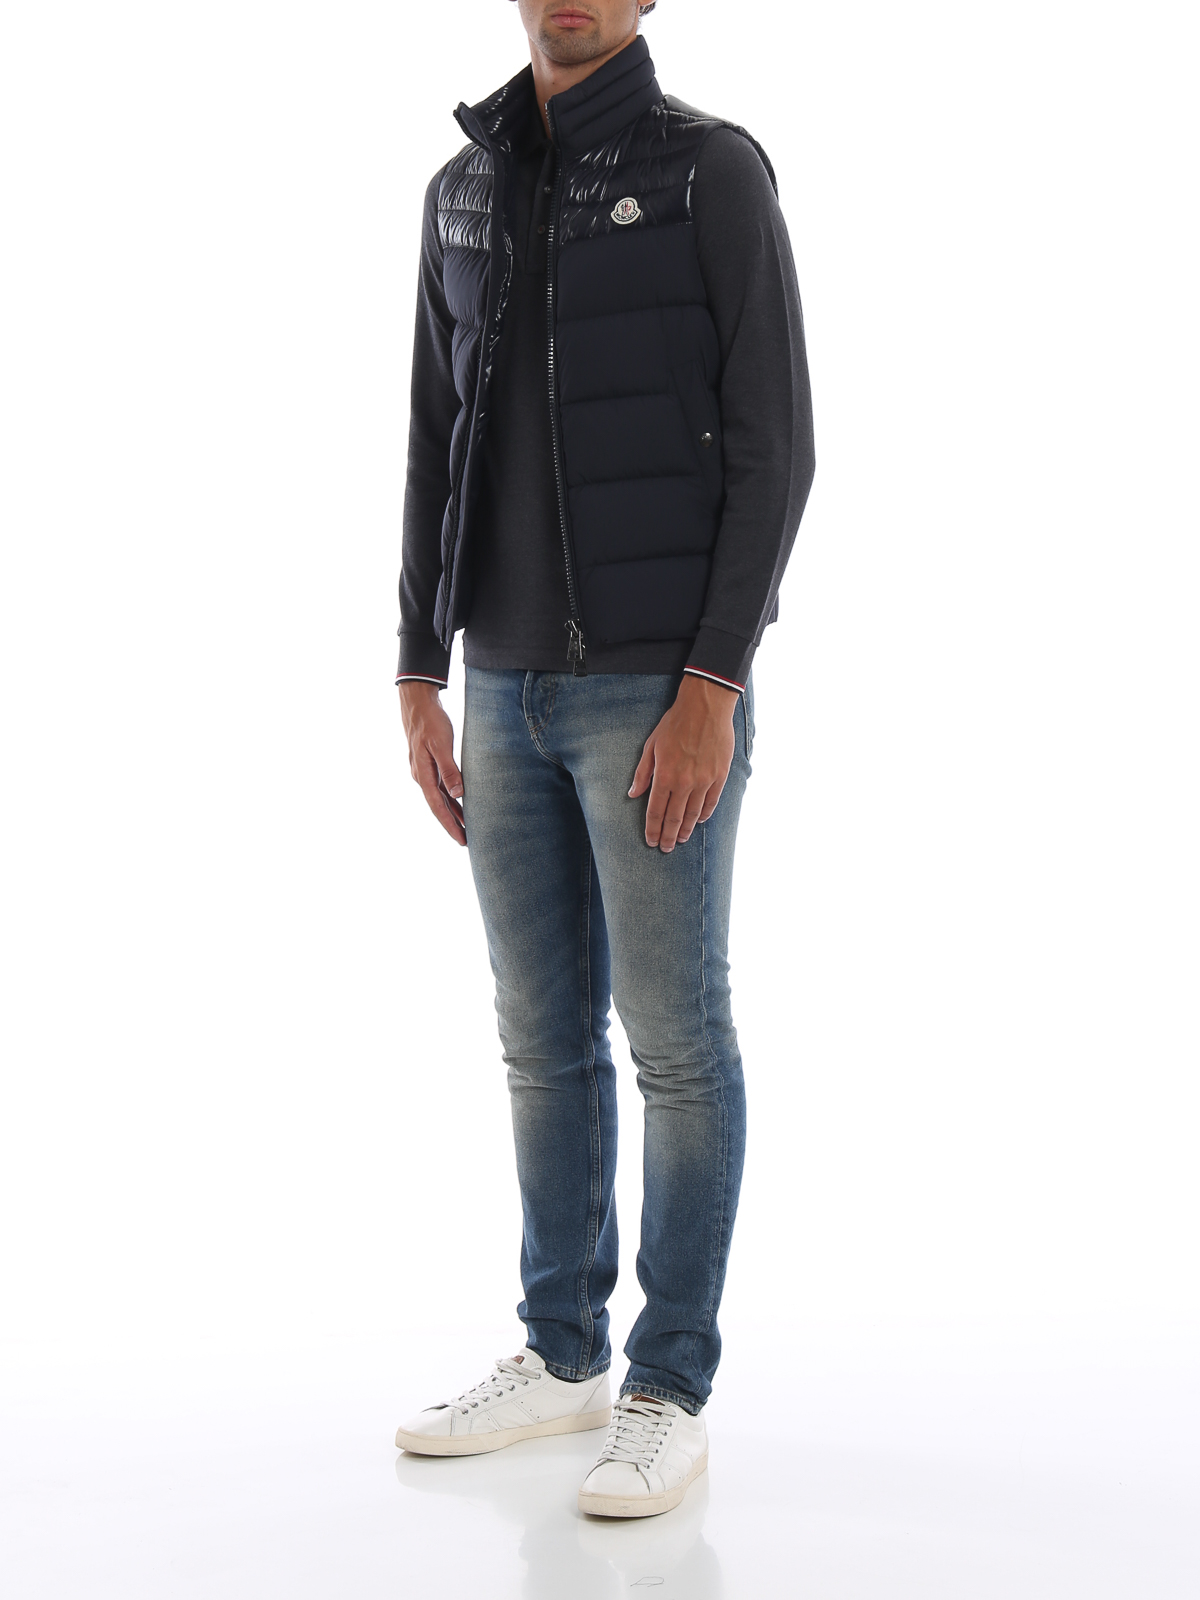 inexpensive moncler vest navy sports coat dbb88 5e95b